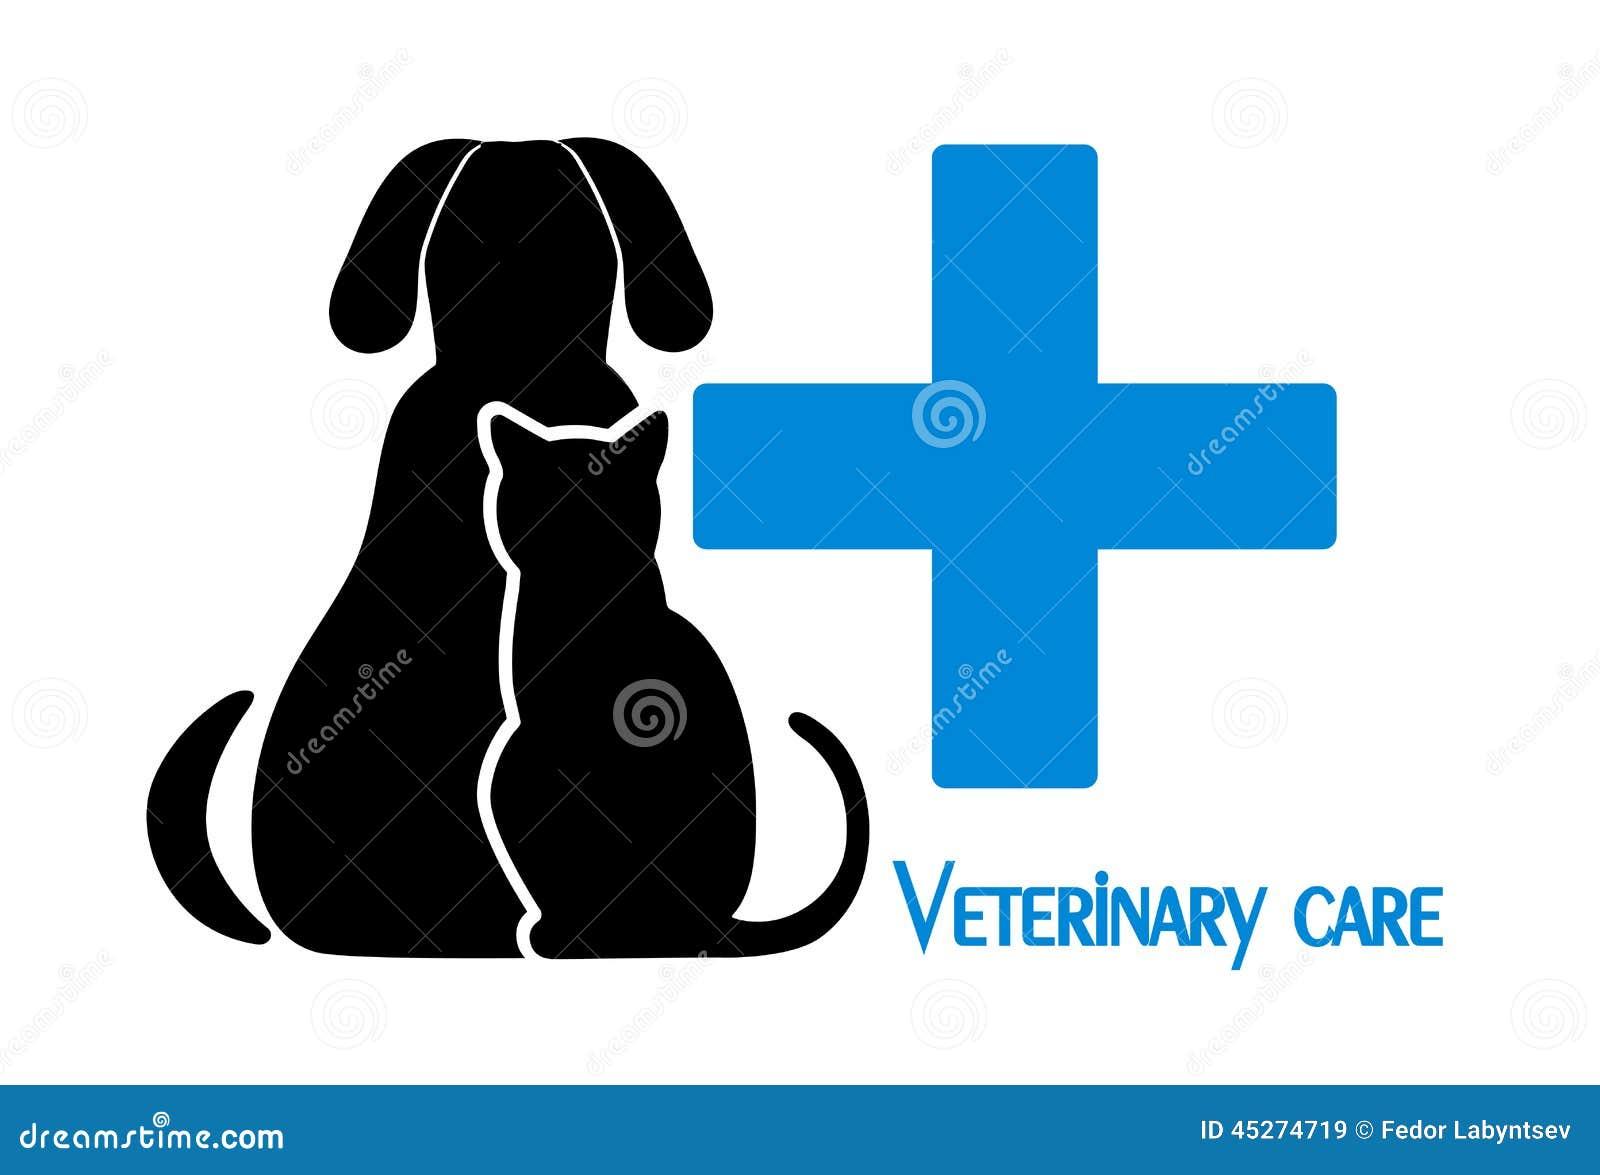 Veterinary Medicine craigslist usa all